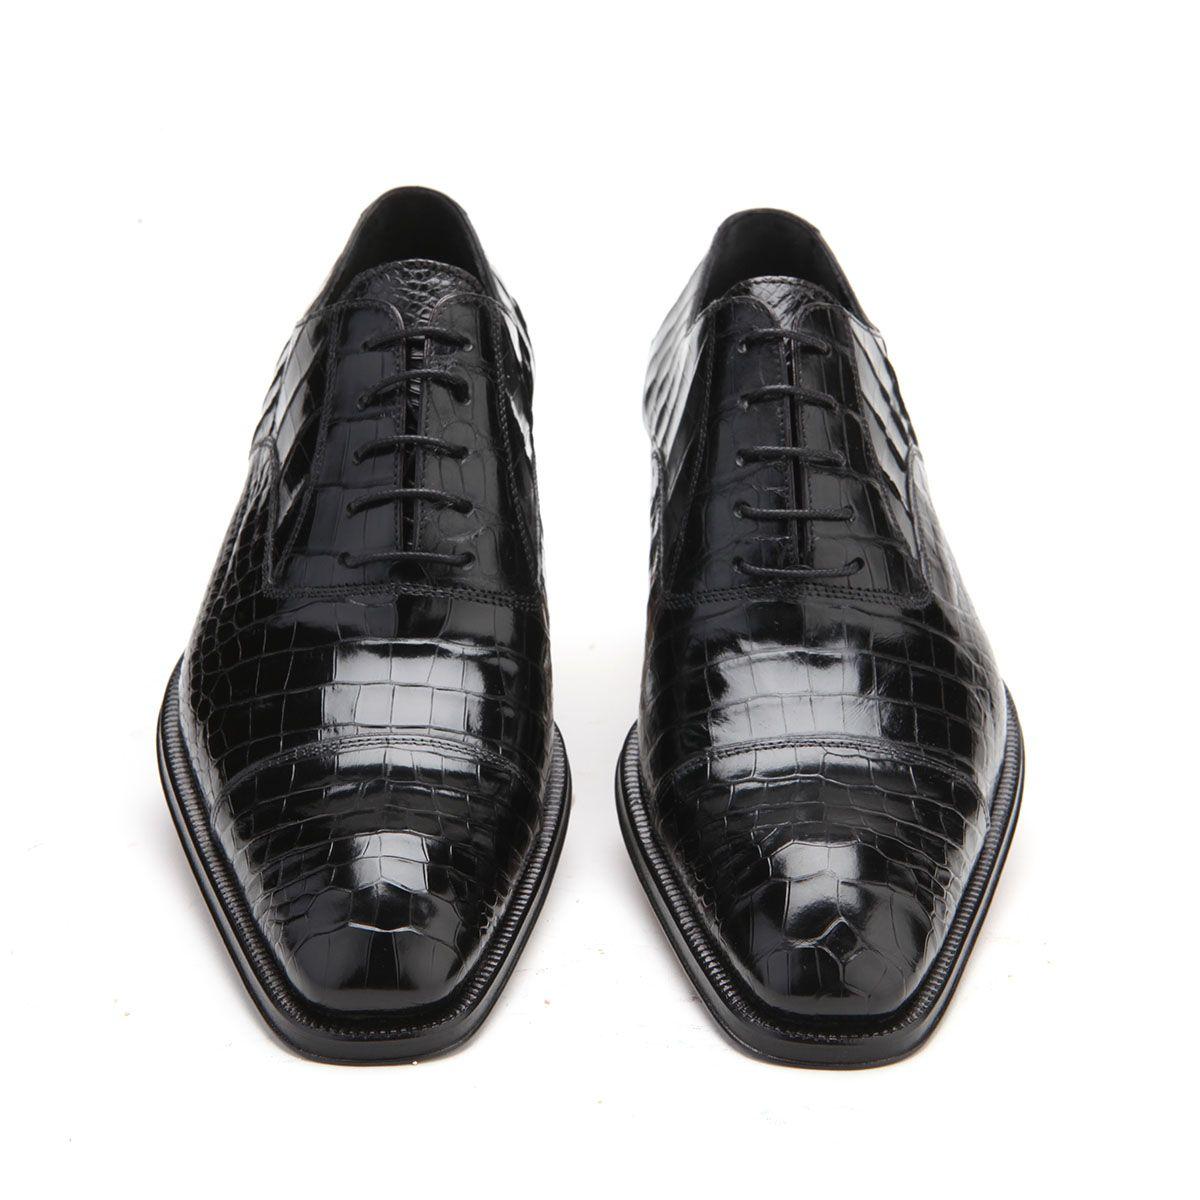 Caporicci Italian Mens Shoes Black Alligator Oxfords Art1114 Cap1007 Italian Shoes For Men Dress Shoes Men Mens Shoes Black [ 1200 x 1200 Pixel ]